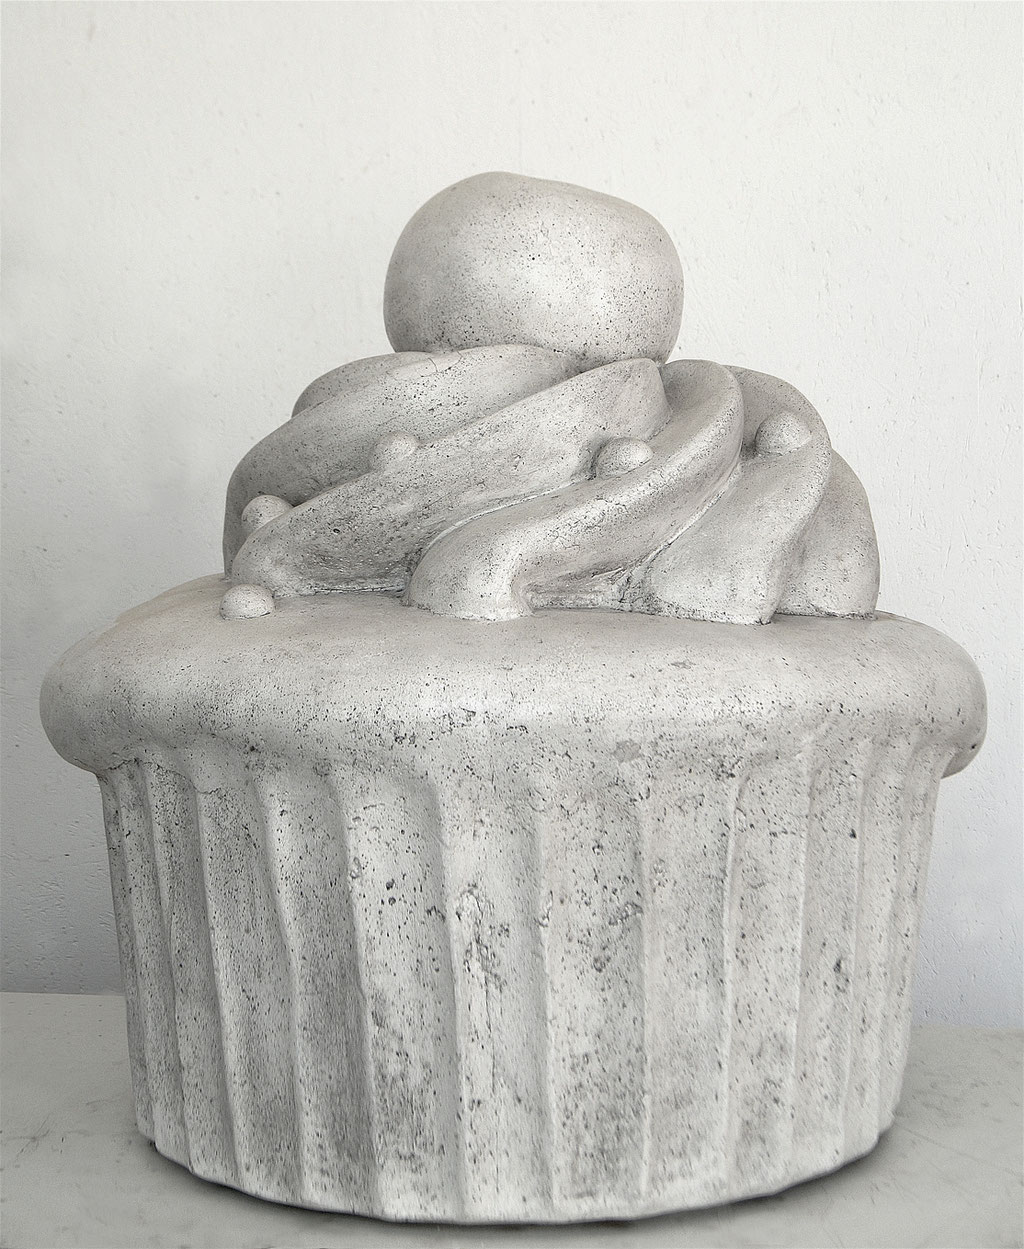 Cupcake, ca. 60x60x60cm, Marmor-Steinguss, Unikat, 2018